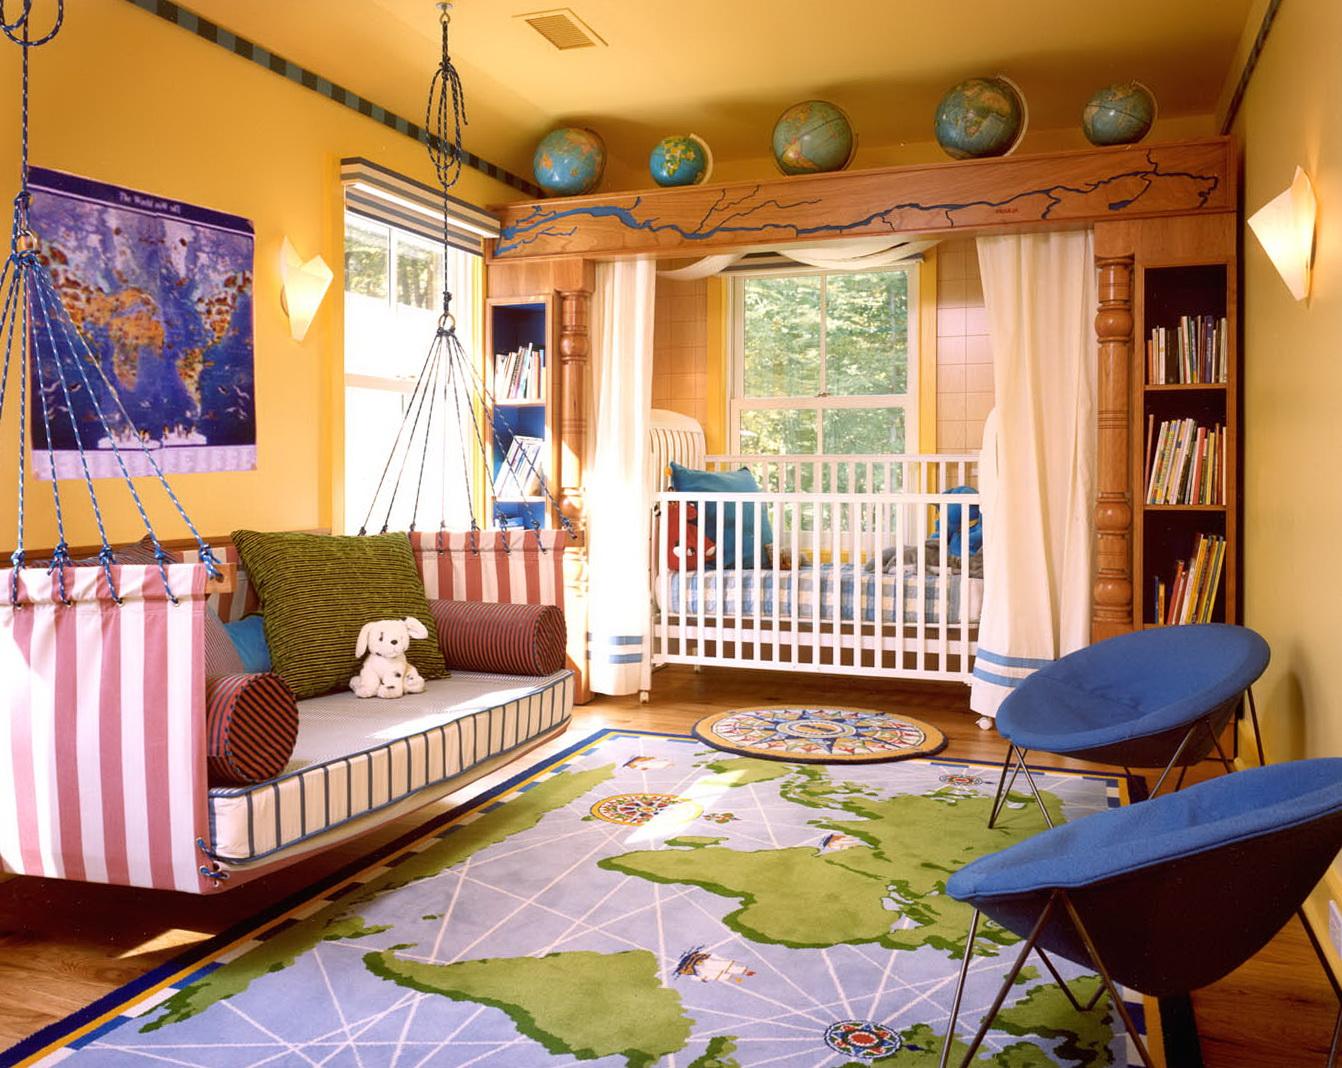 Modern Toddler Bedroom Ideas